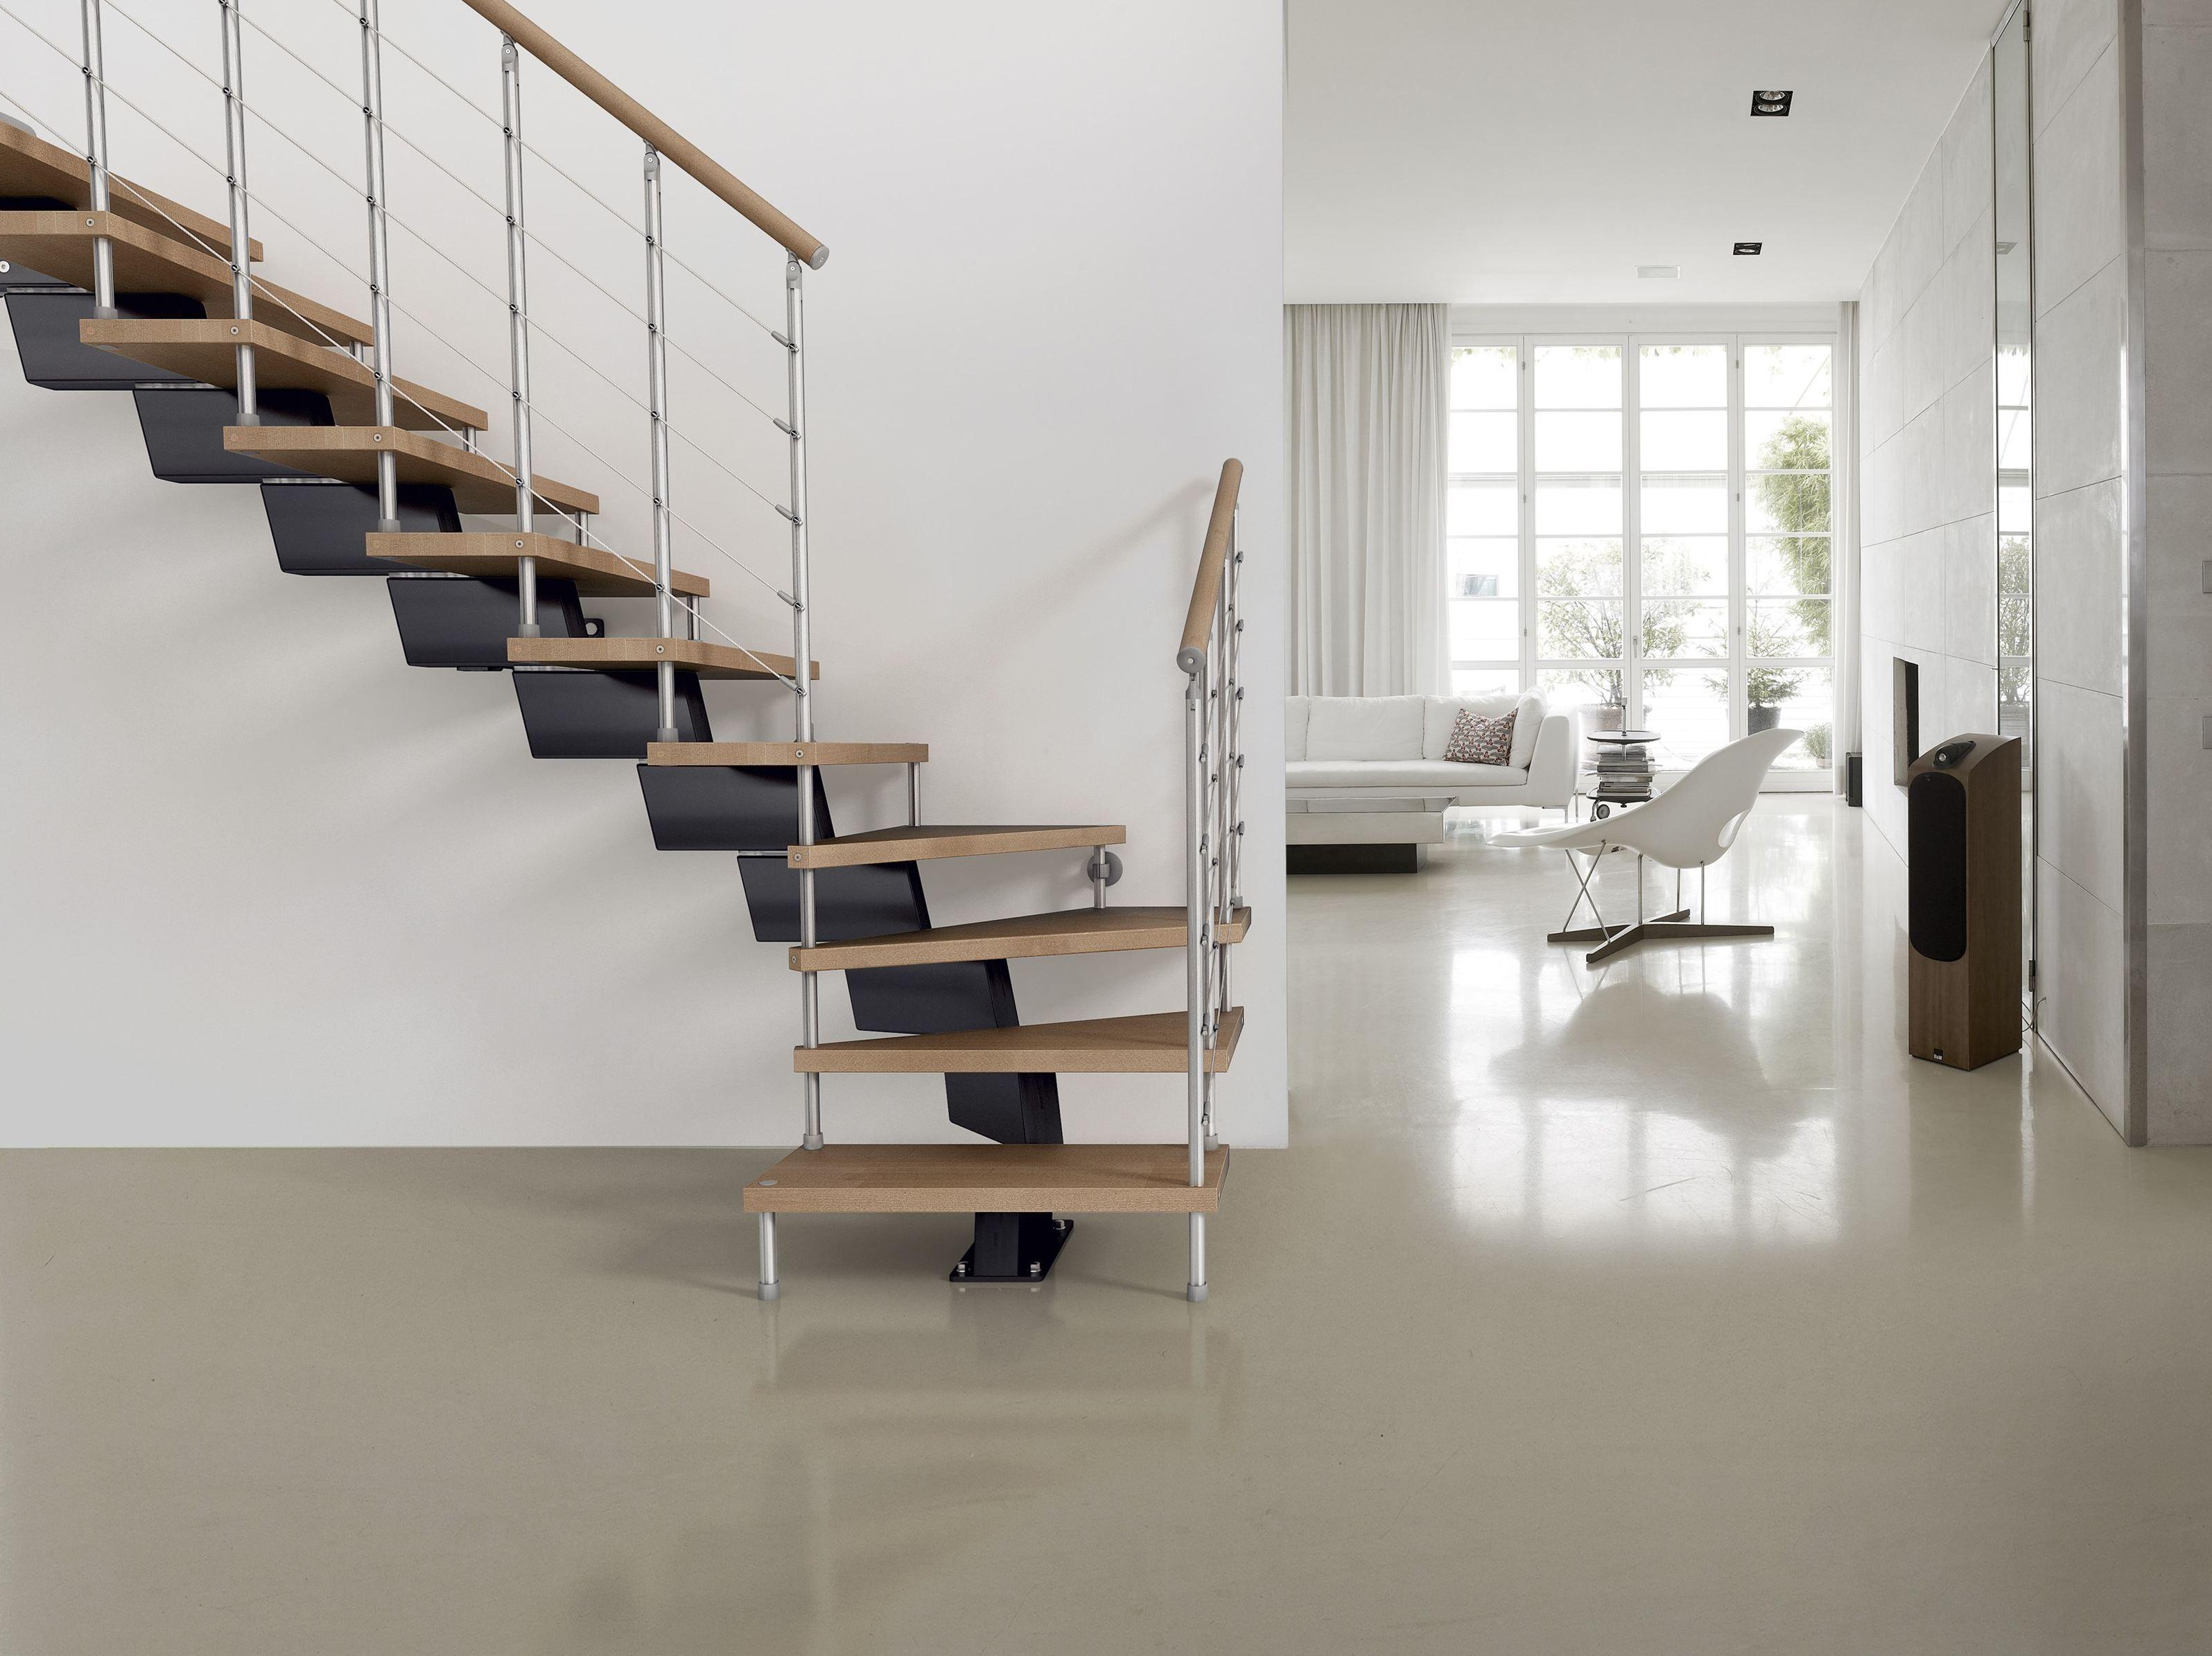 Genius 040 escalier ouvert by fontanot spa - Escalier ouvert salon ...